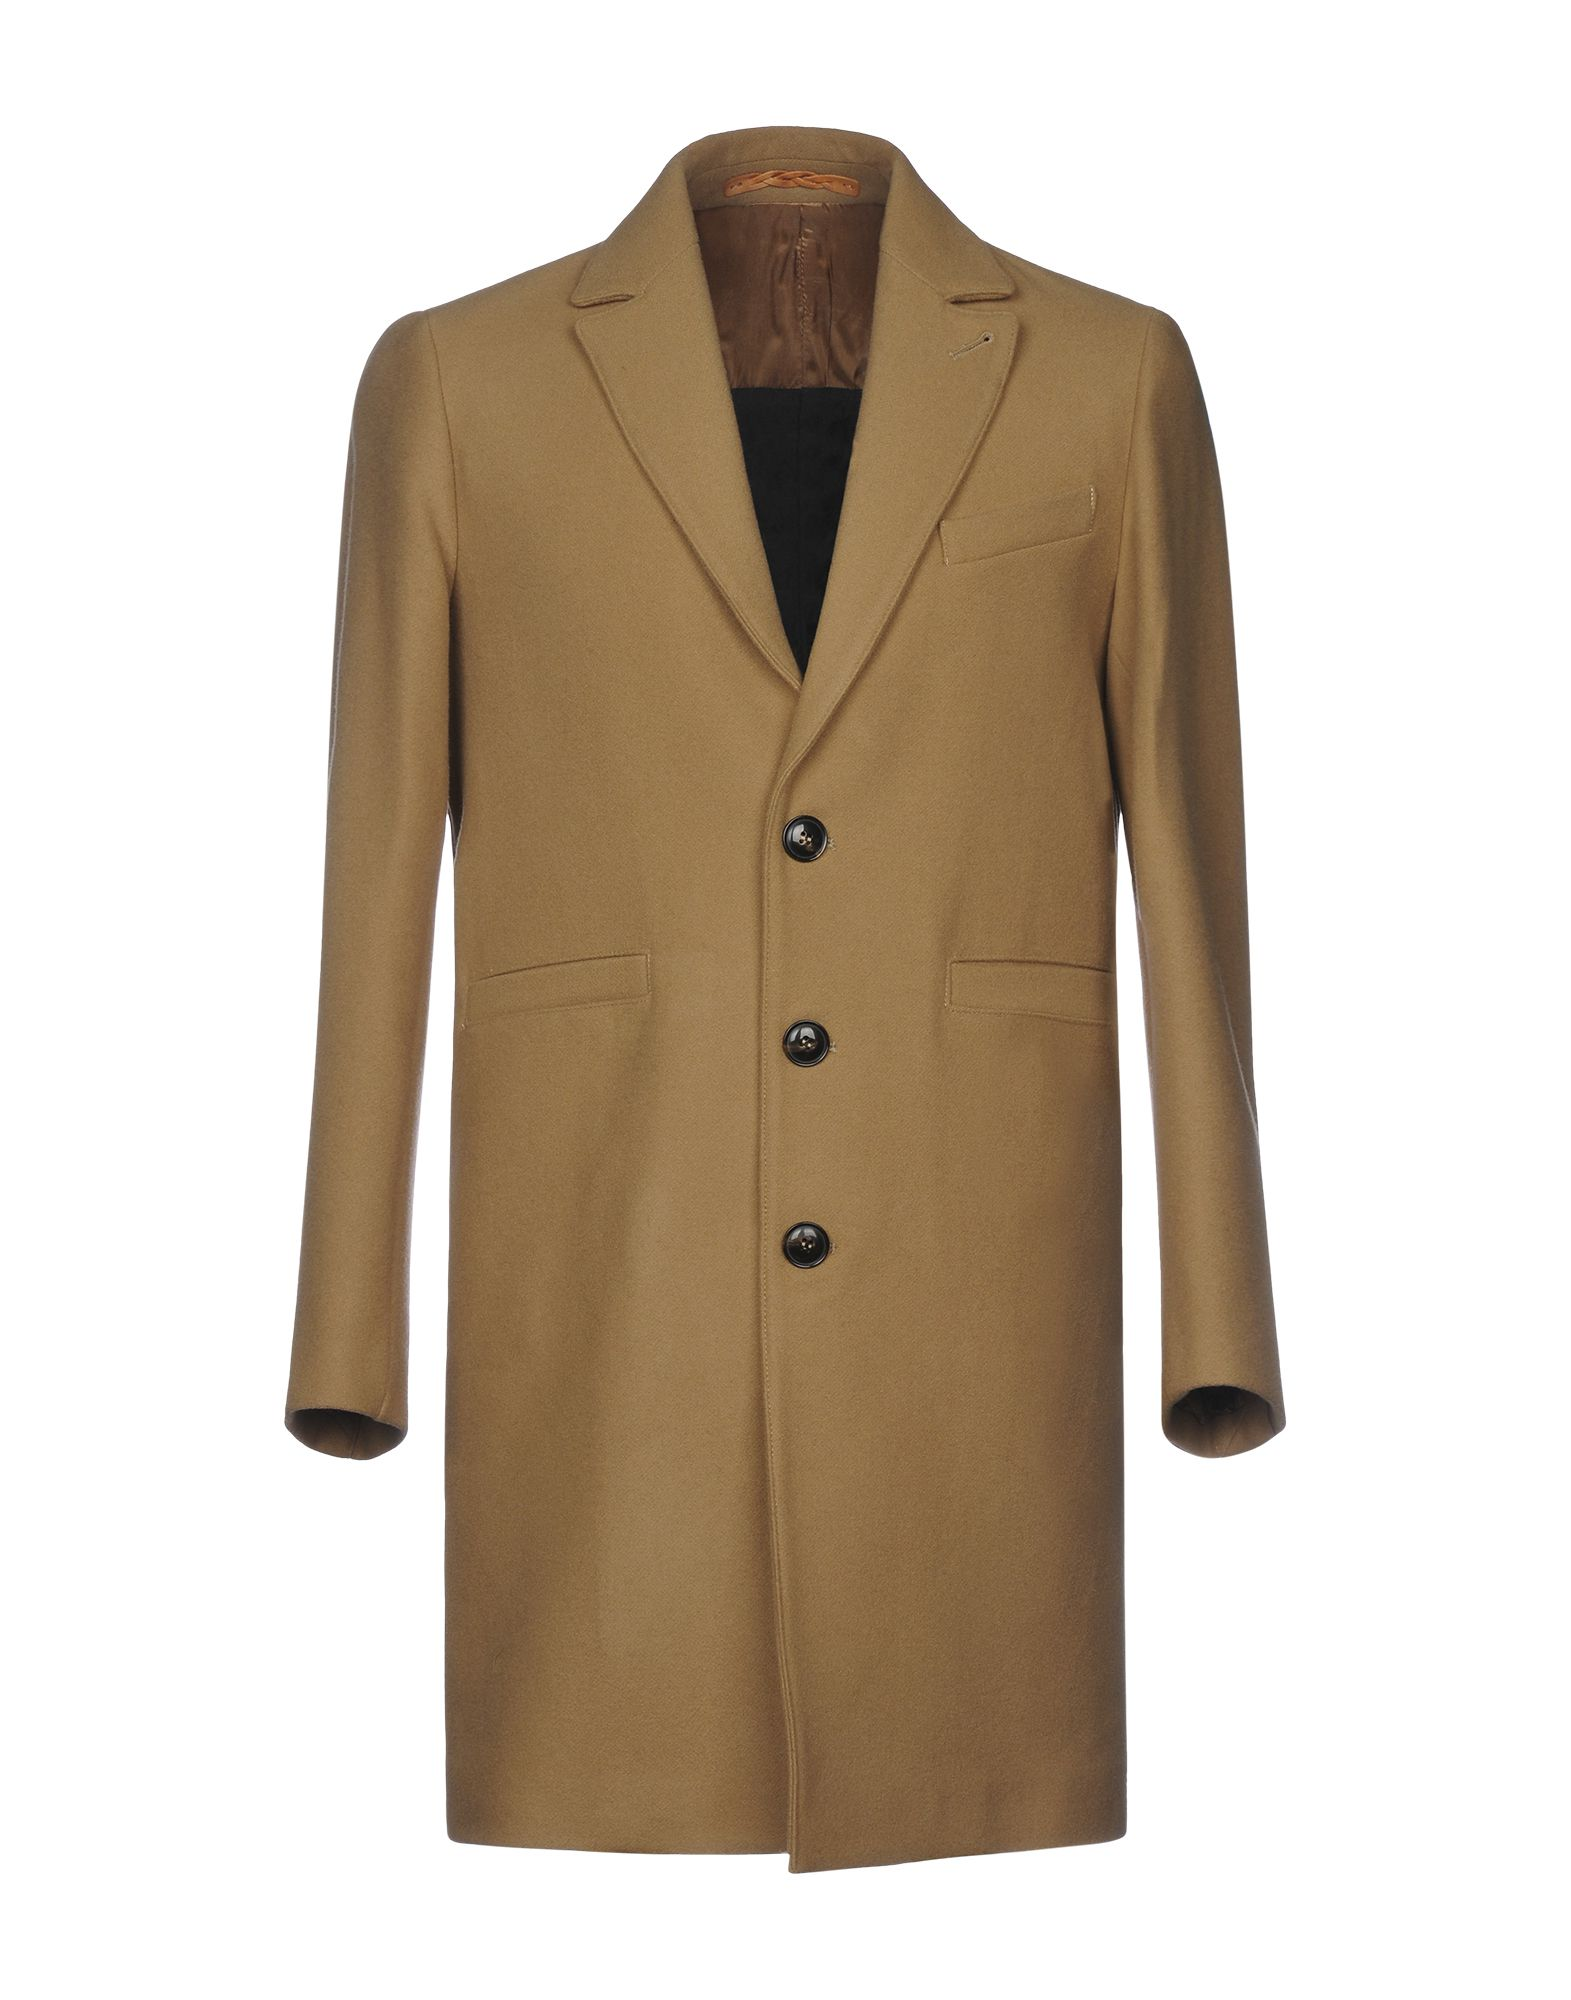 Cappotto ..,Beaucoup Donna - Acquista online su